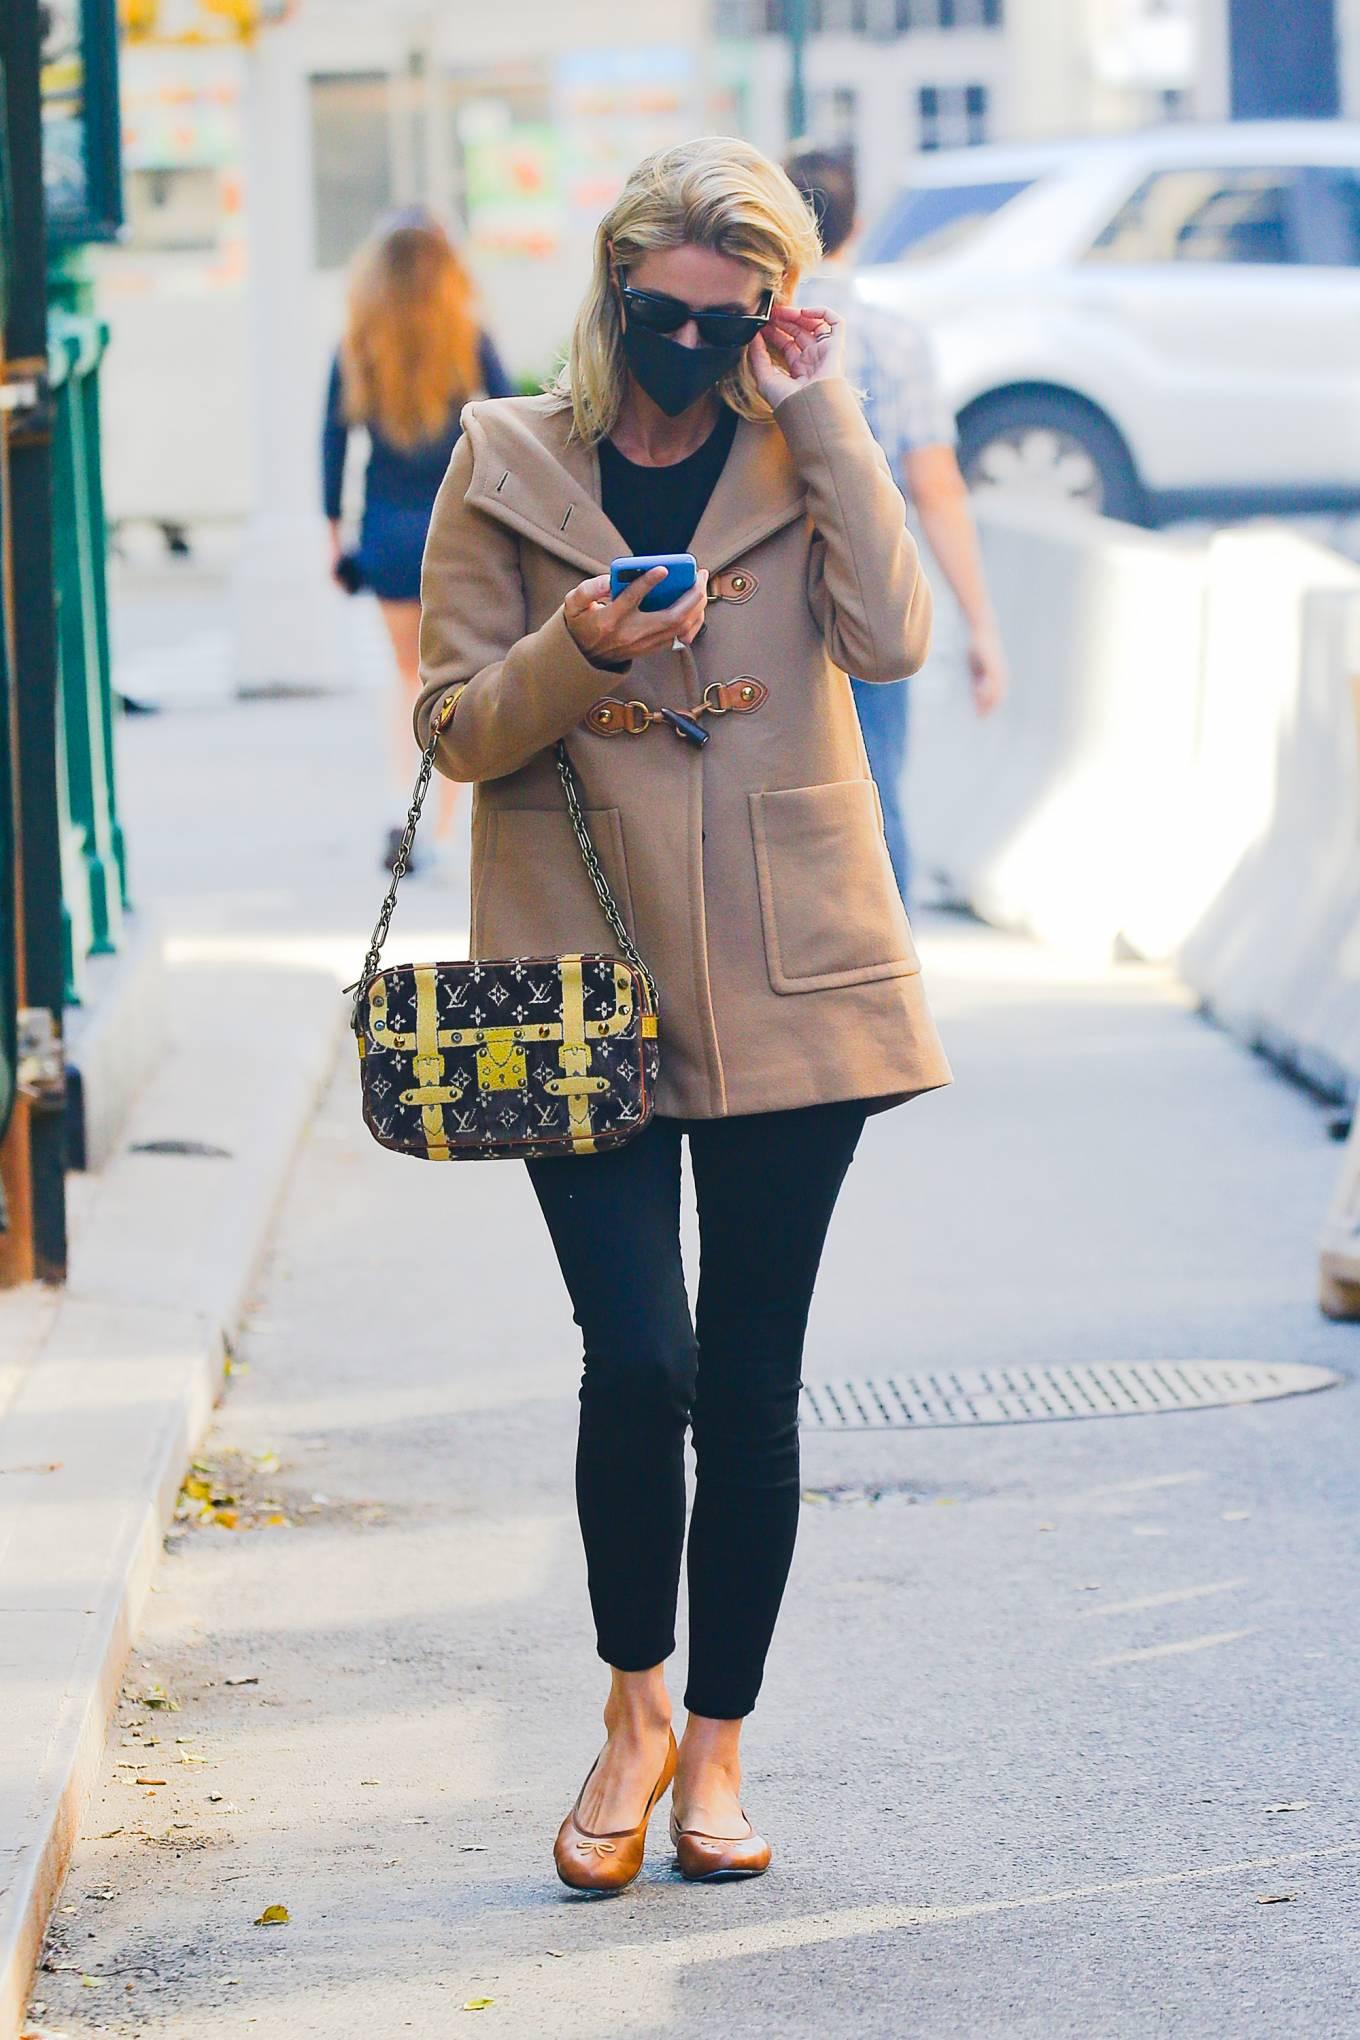 Nicky Hilton - Carrying Louis Vuitton handbag in New York